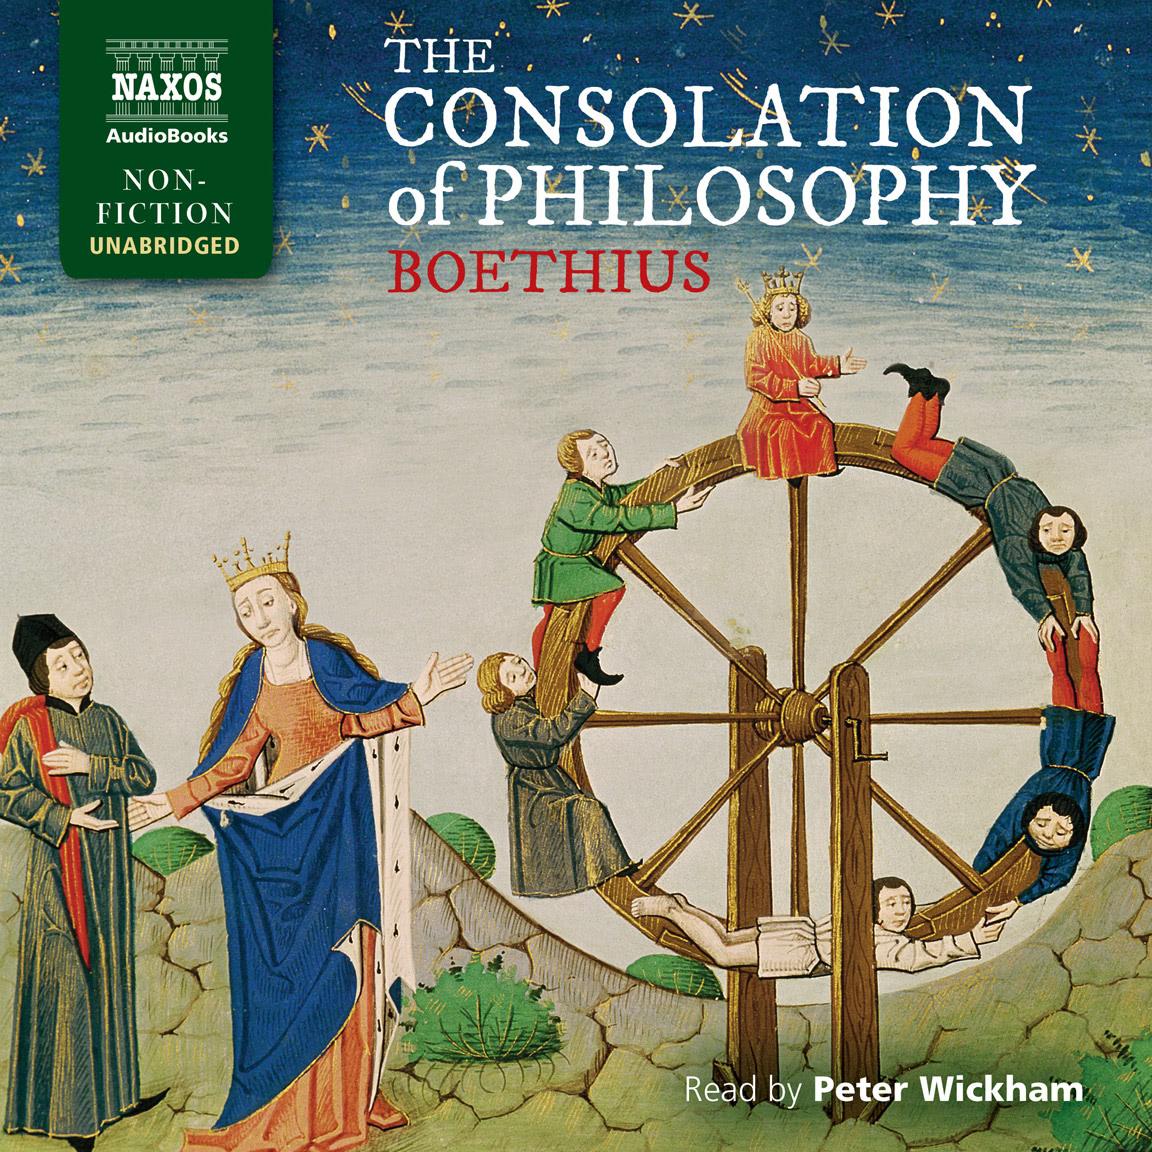 The Consolation of Philosophy (unabridged)